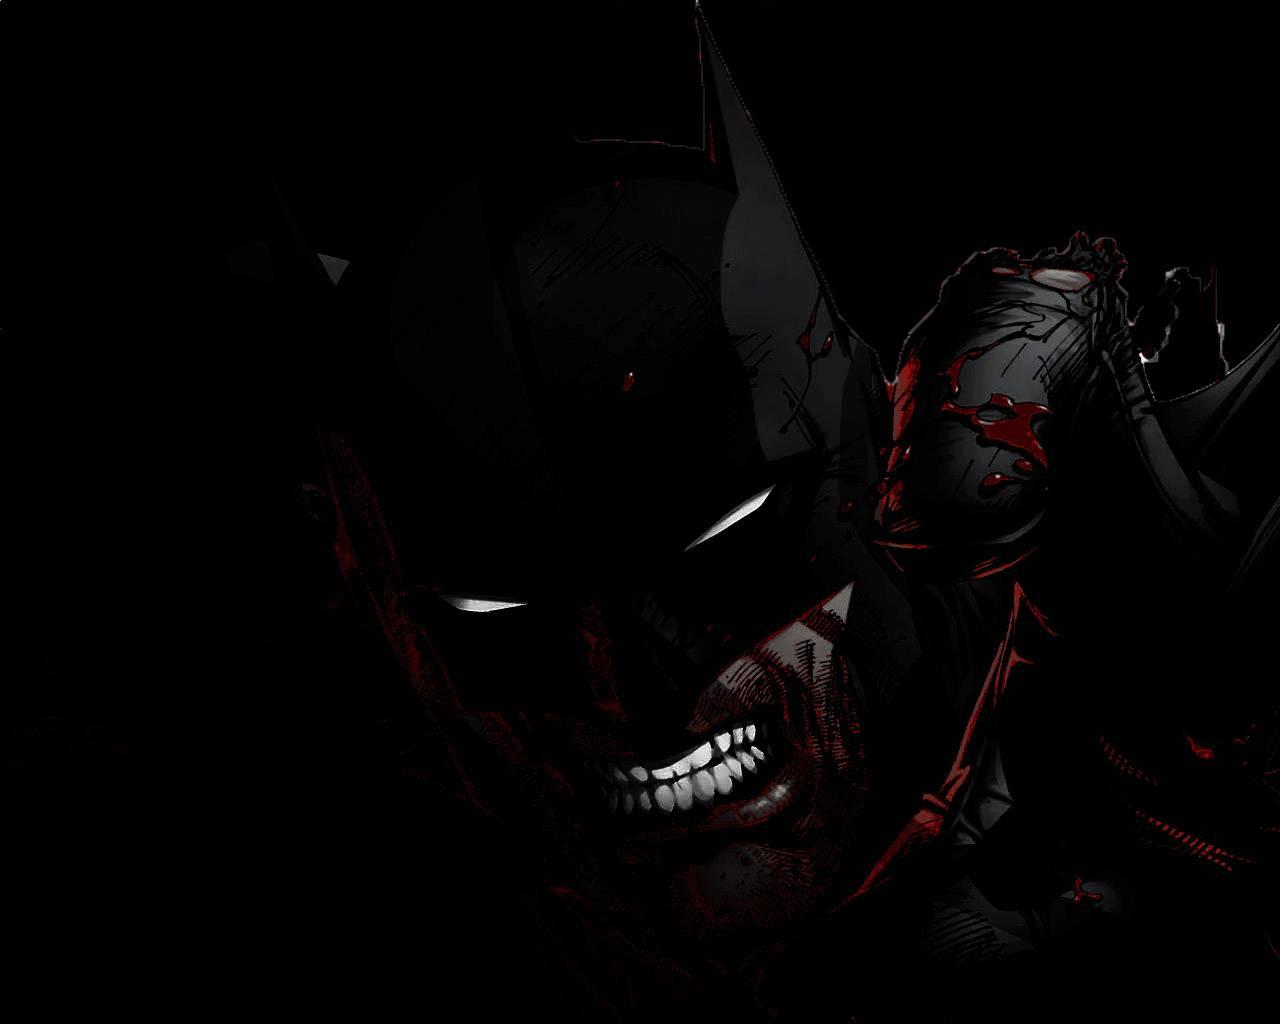 Batman HD Wallpapers for Desktop (12)